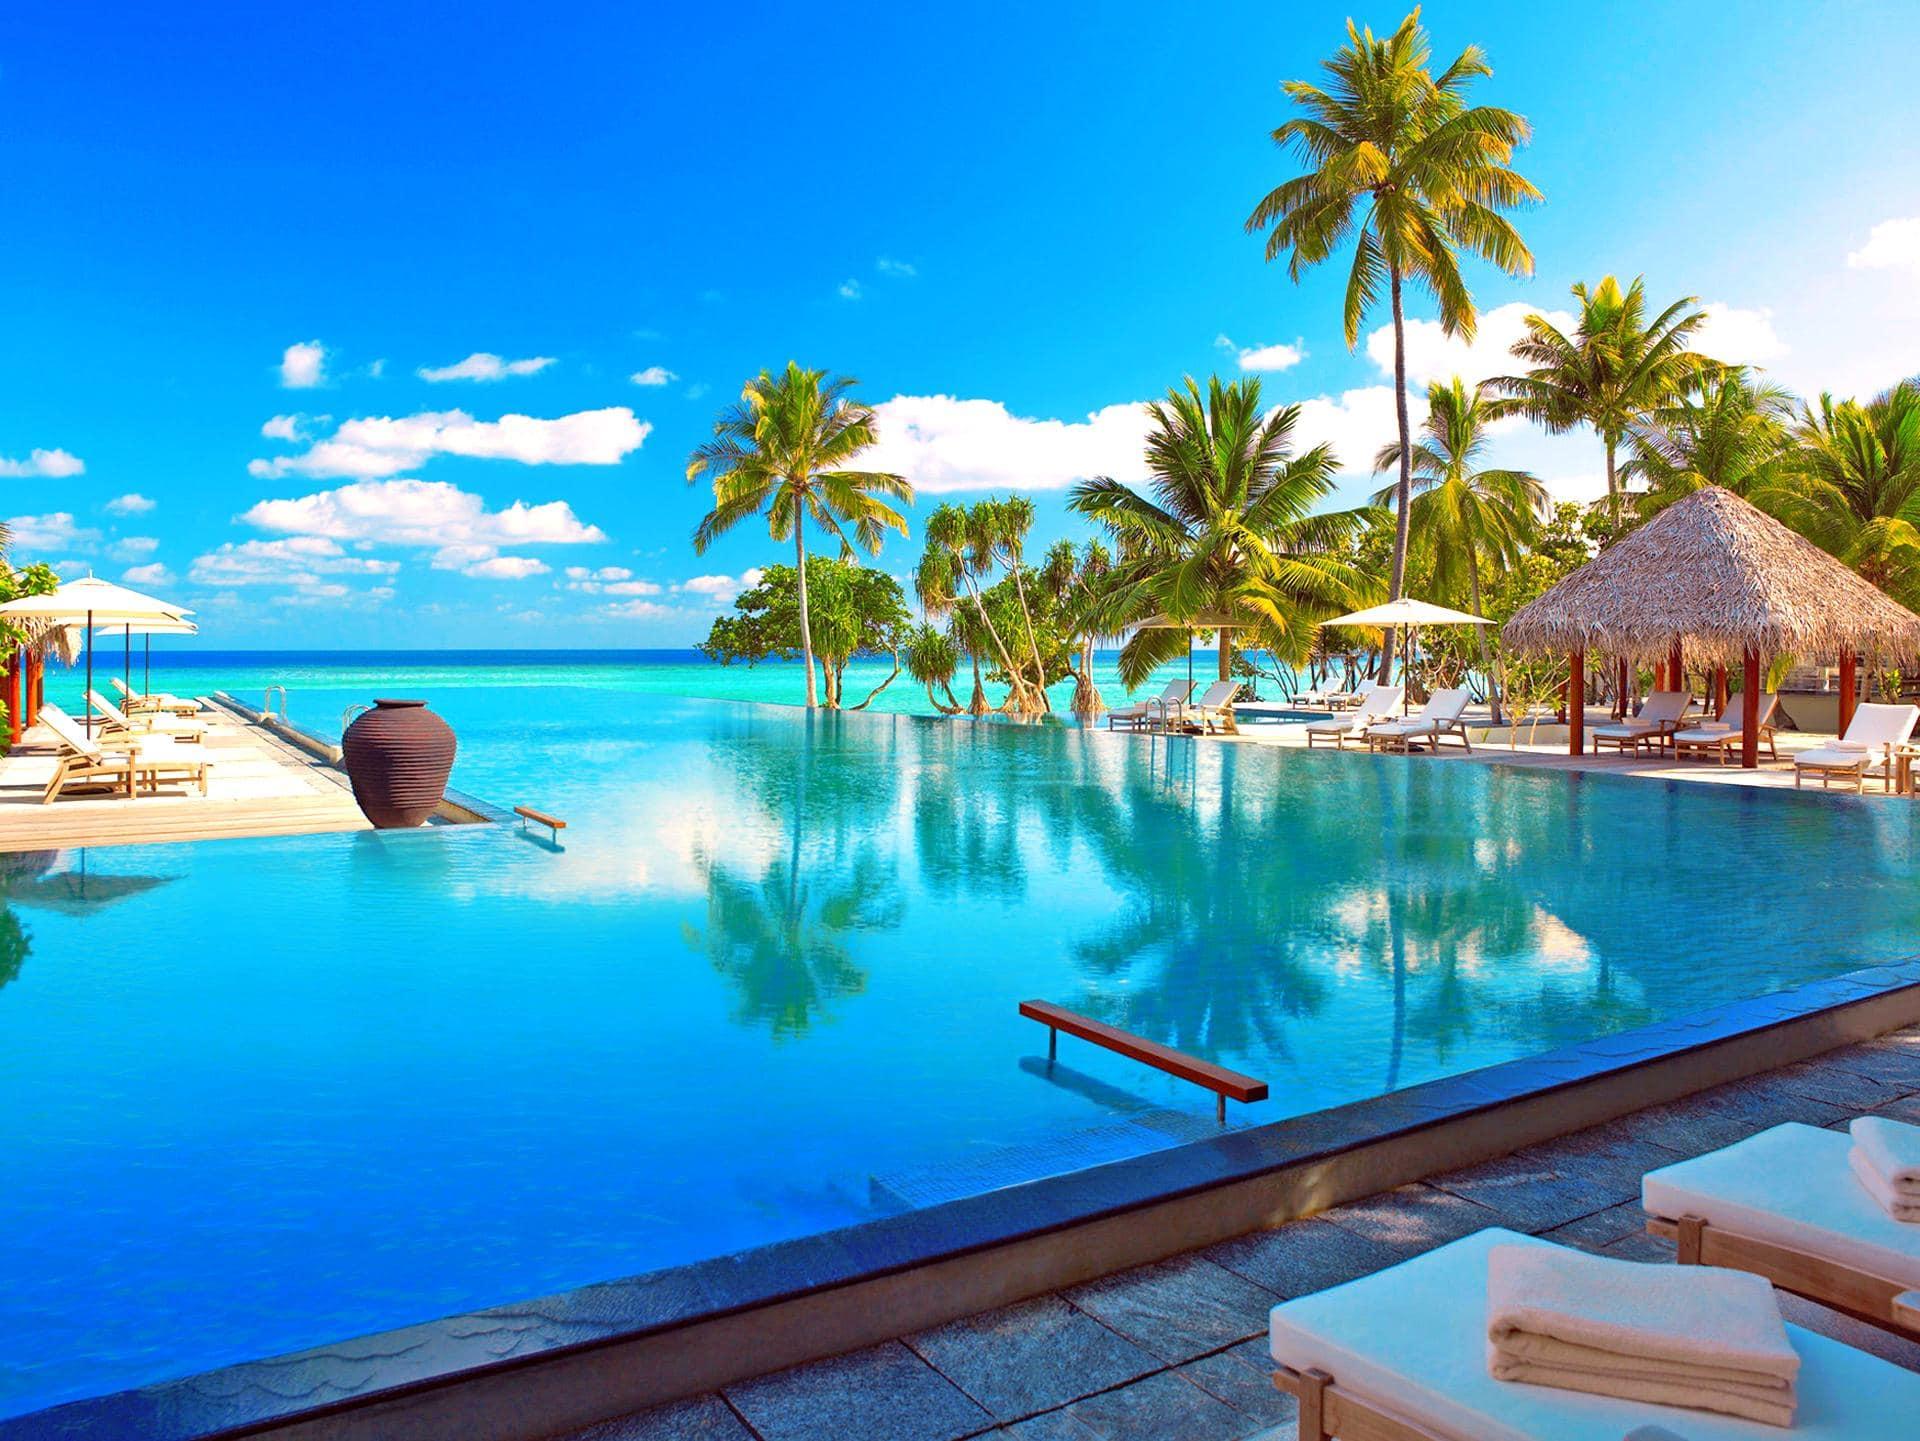 Maldives beach holiday honeymoon luxury for Luxury getaways